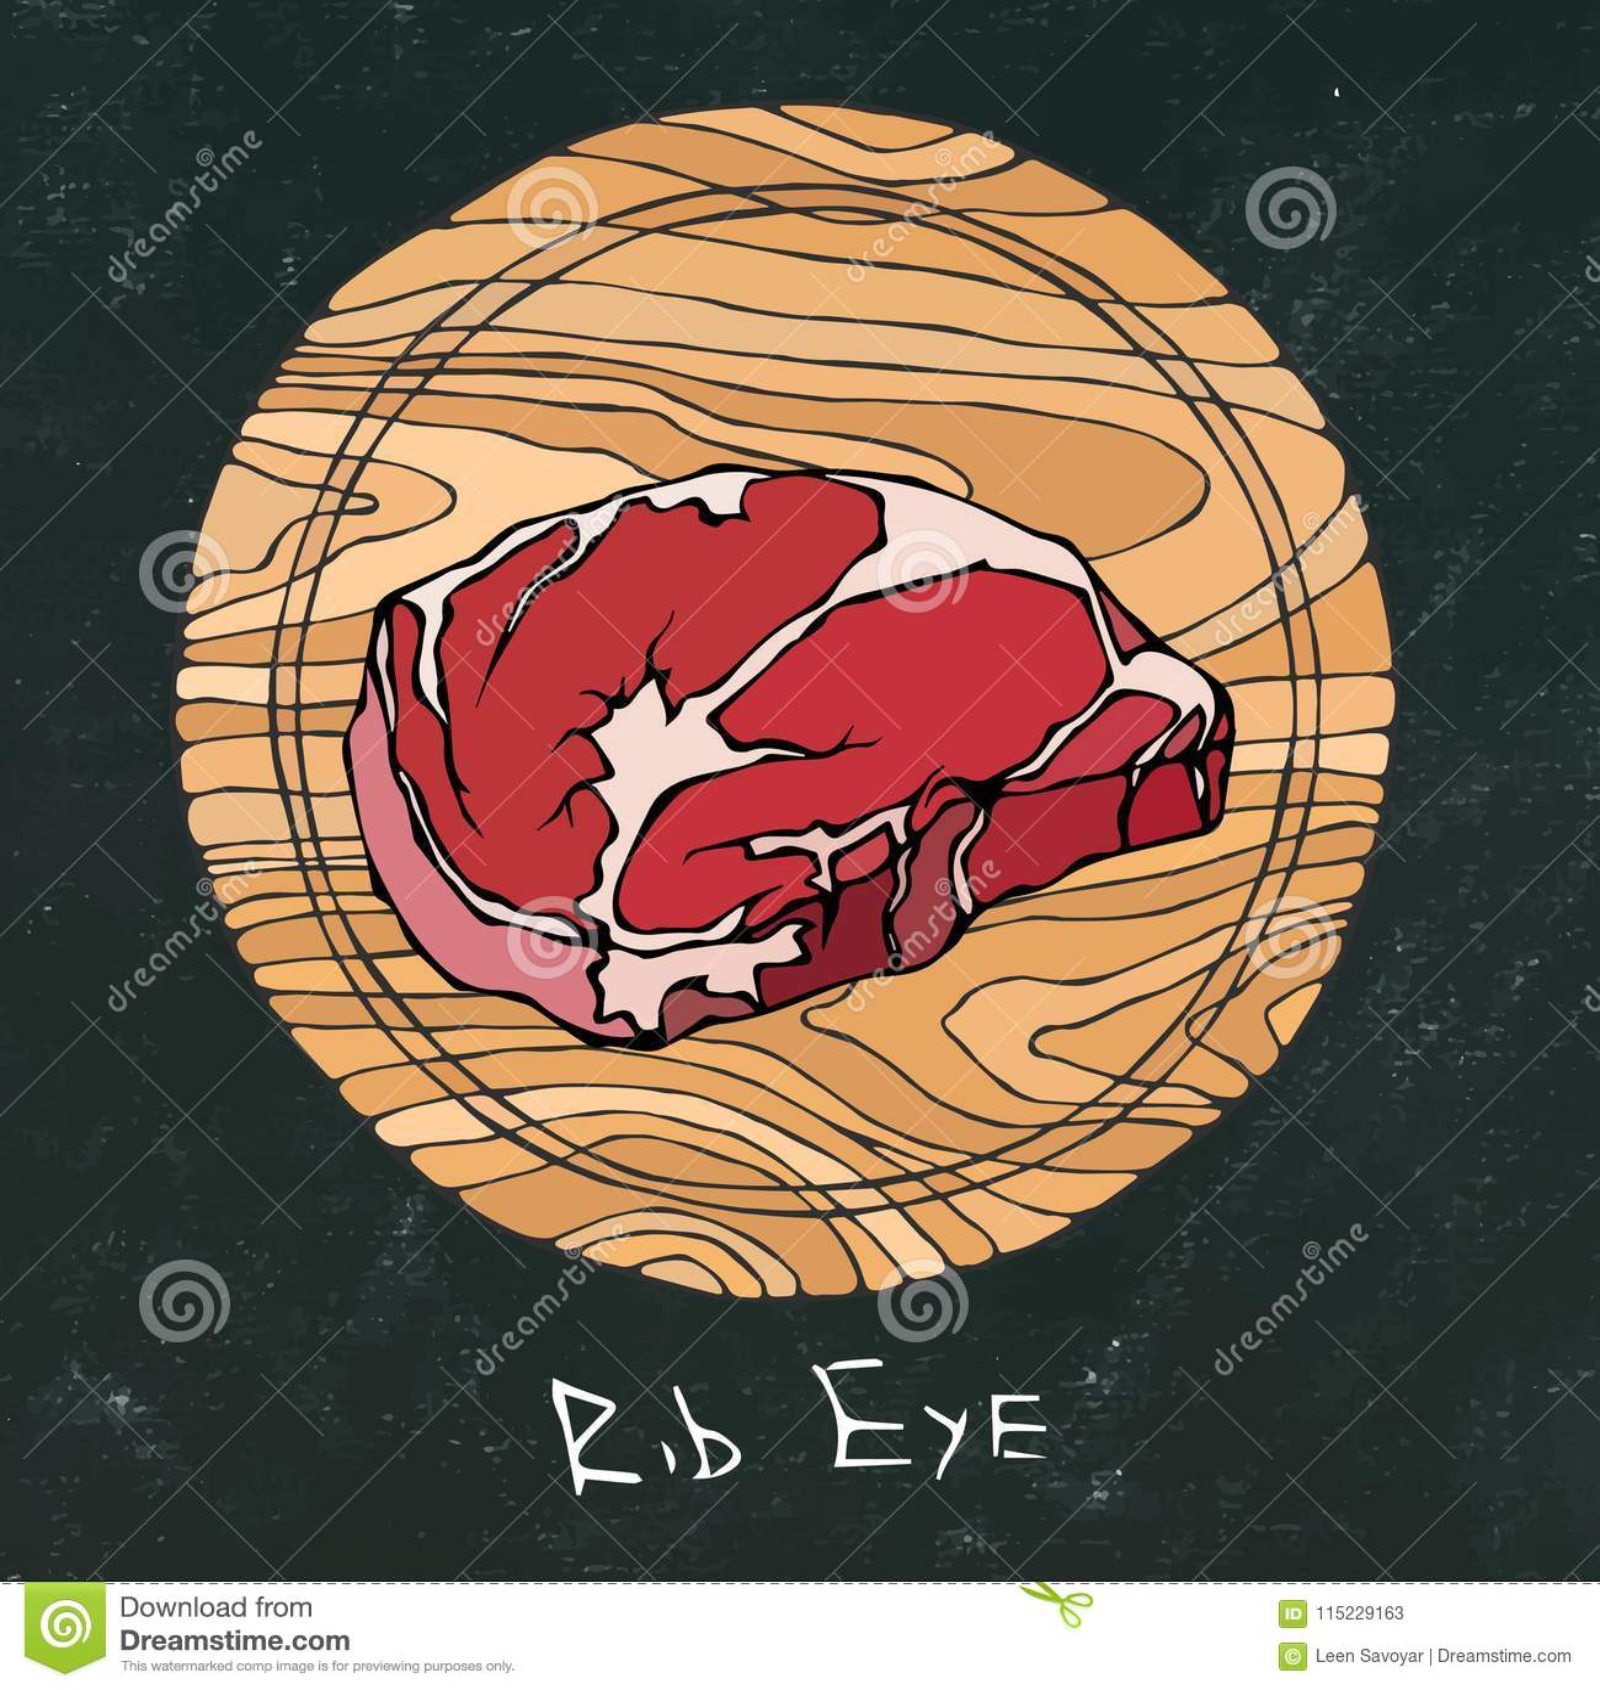 Black Chalk Board. Most Popular Steak on a Round Wooden Cutting Board. Beef Cut. Meat Guide for Butcher Shop or Steak House Restau